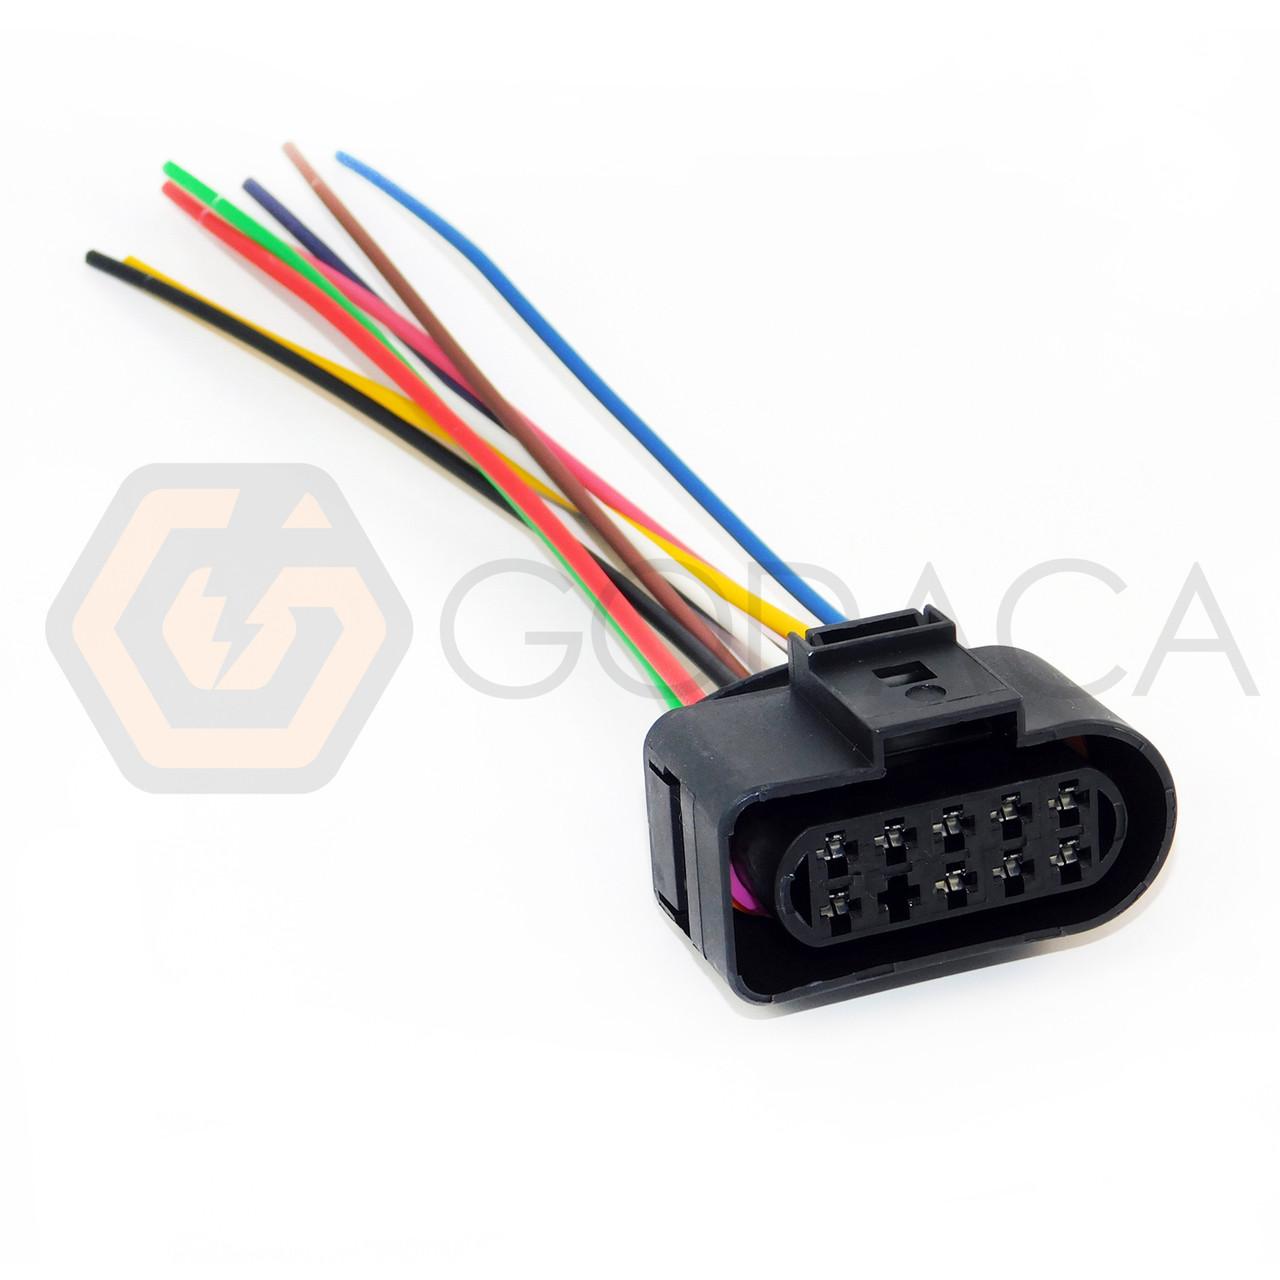 1 x connector headlight for audi vw seat skoda 1j0973735 1j0 973 735 9 way ford godaca llc  [ 1280 x 1280 Pixel ]